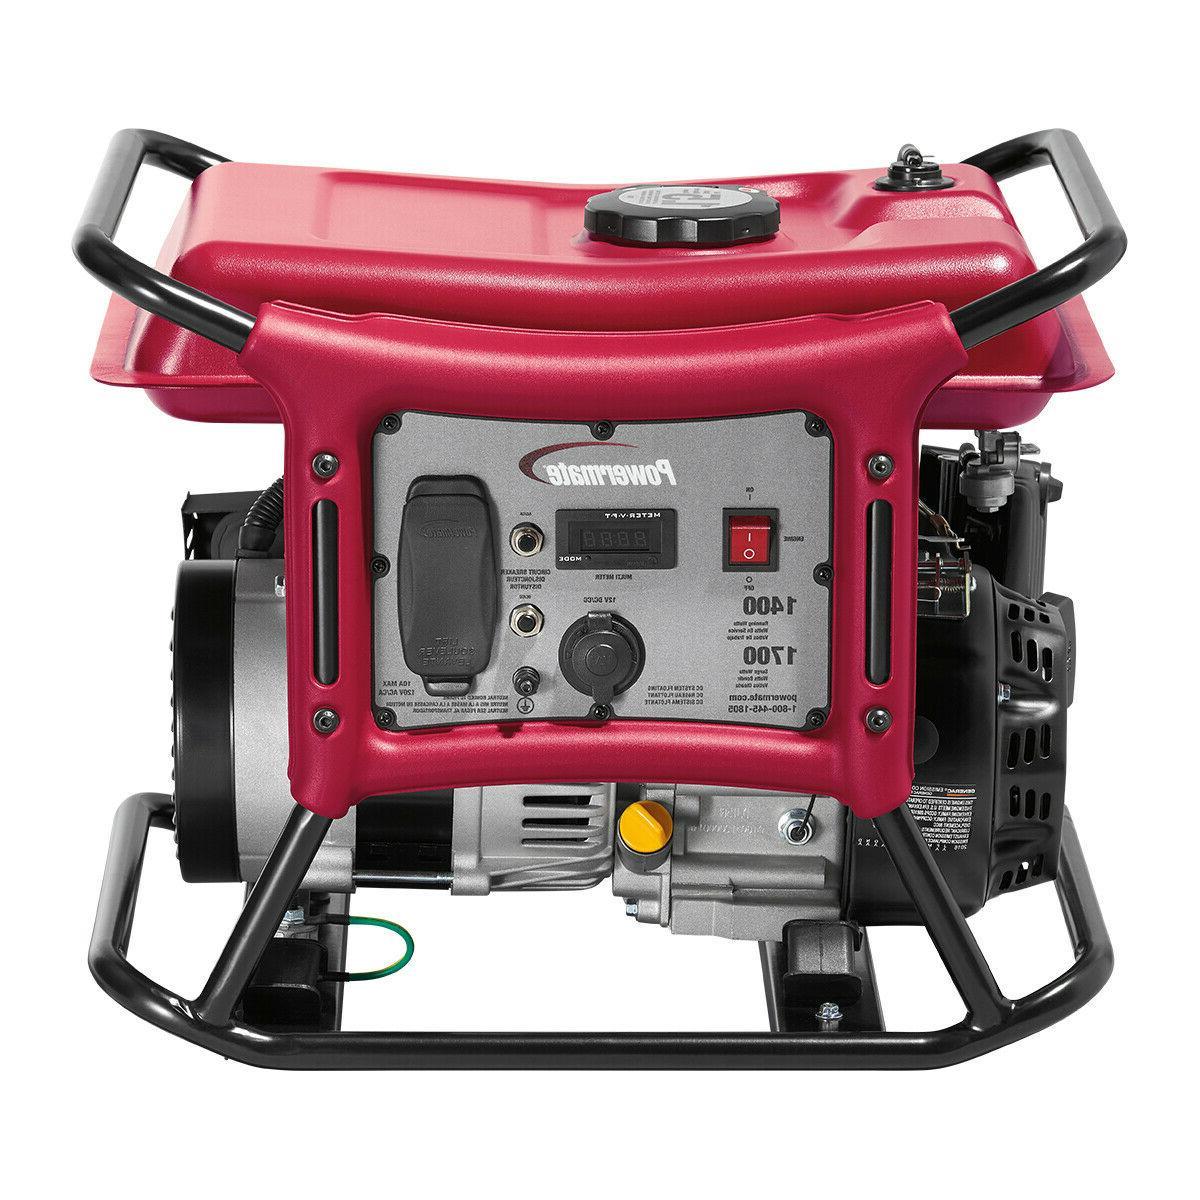 Powermate - 1,400 Watt Portable State